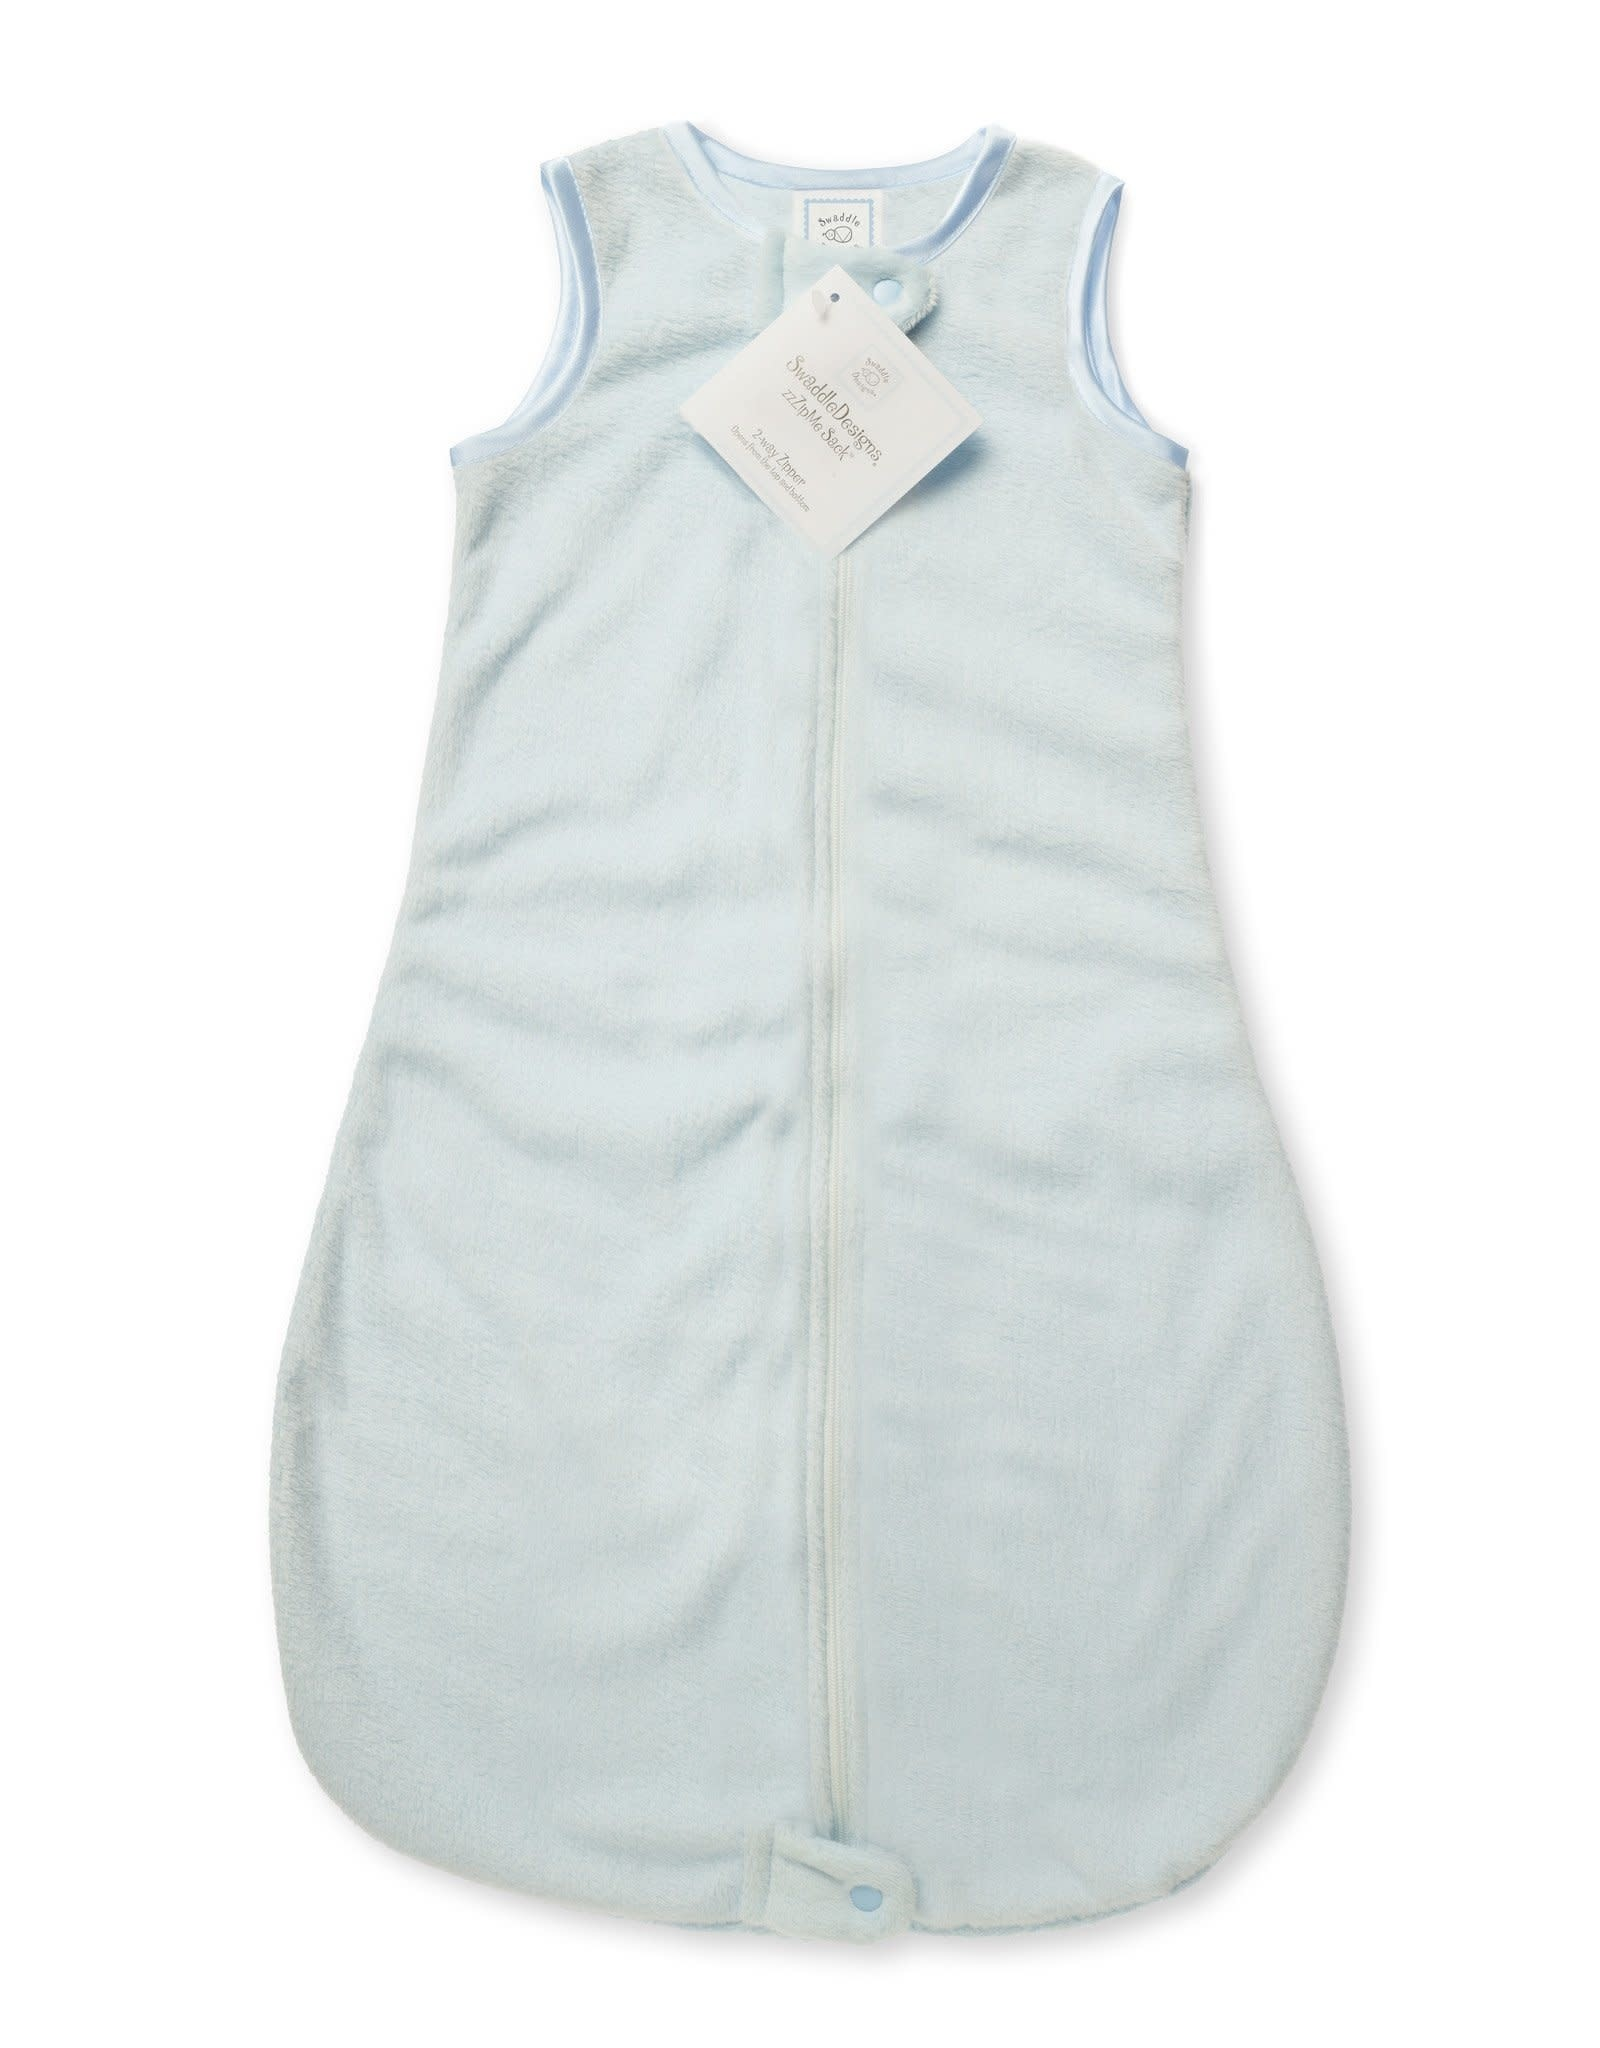 Swaddle Designs Baby Velvet Sleep Sack